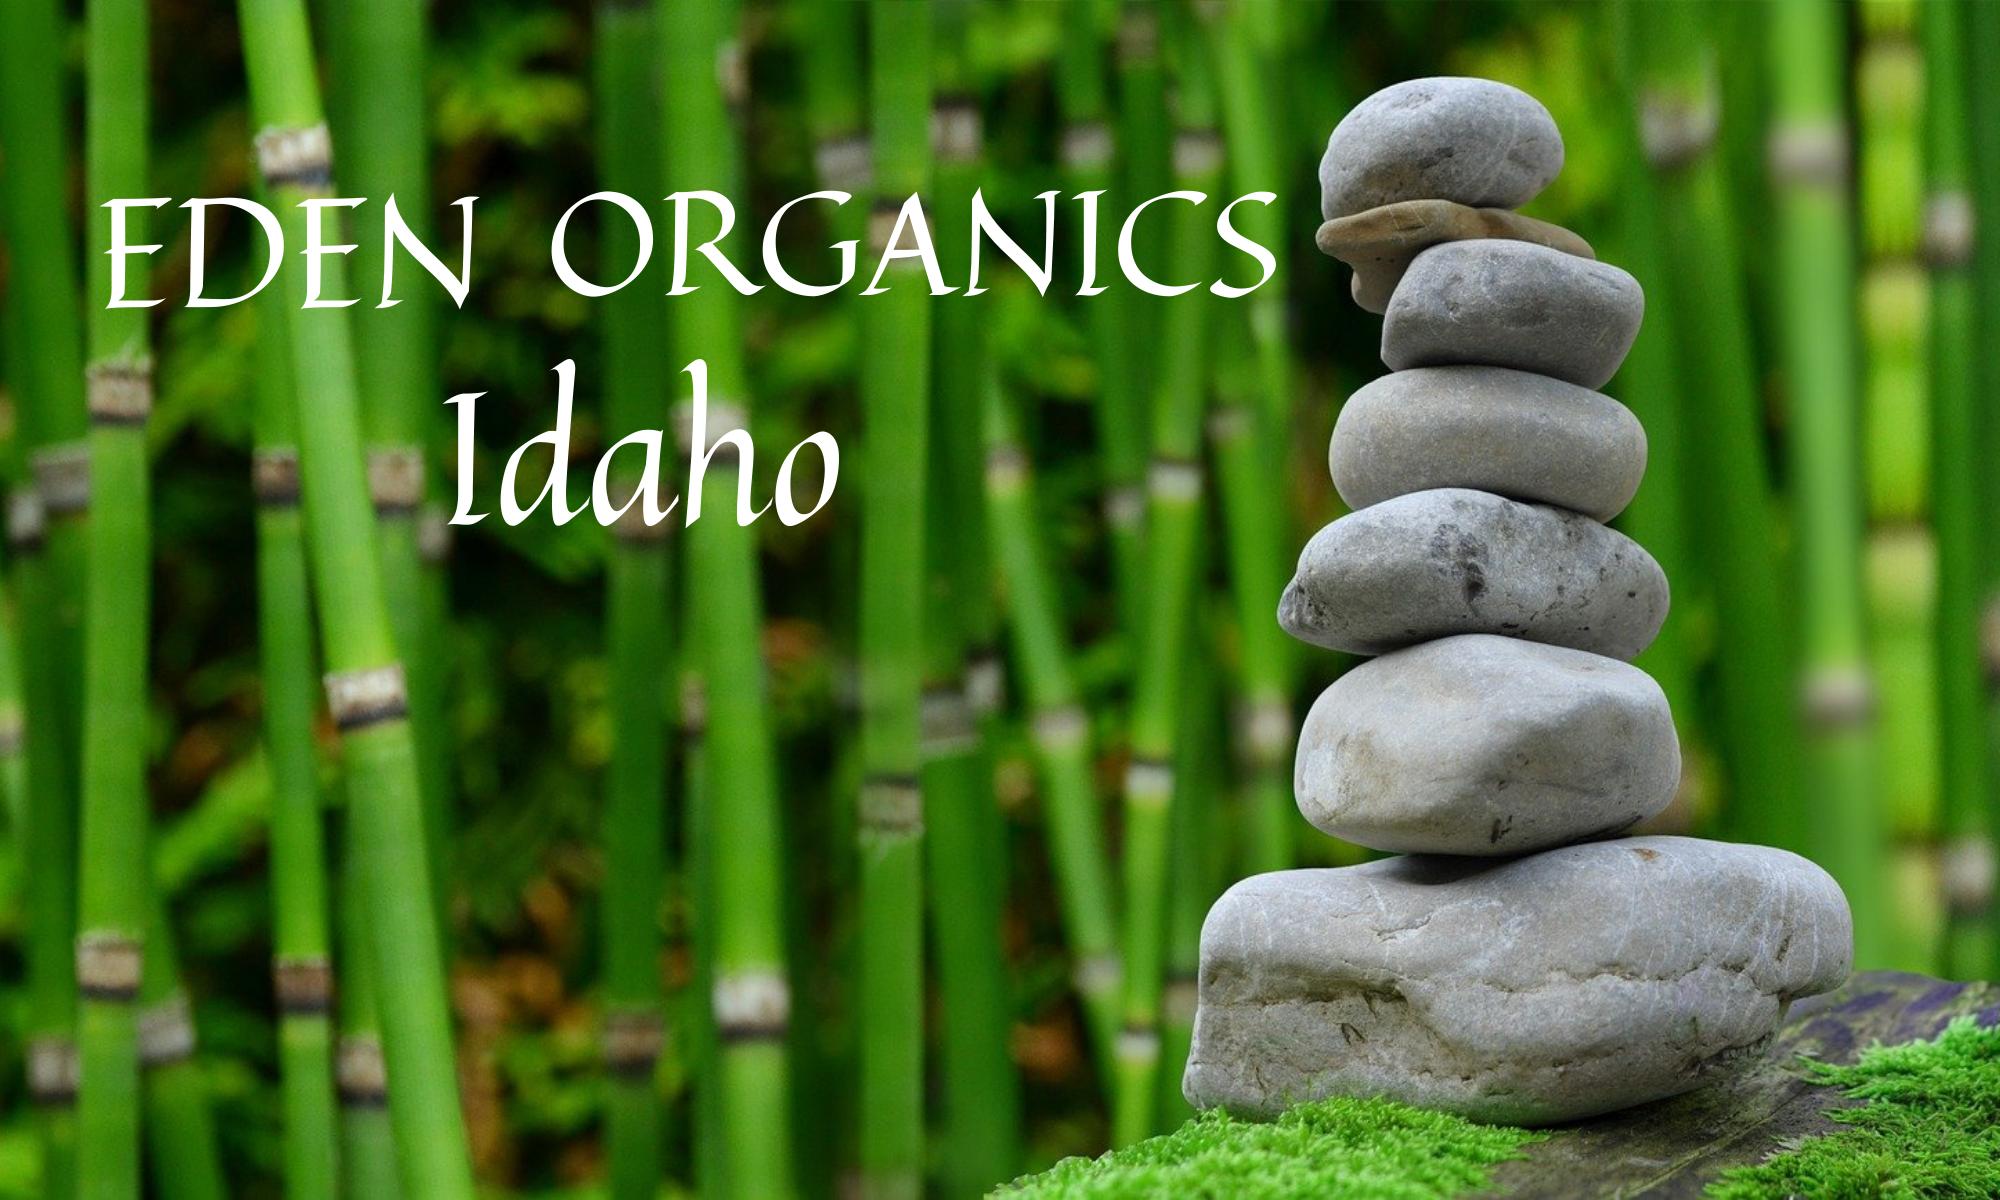 Eden Organics Idaho